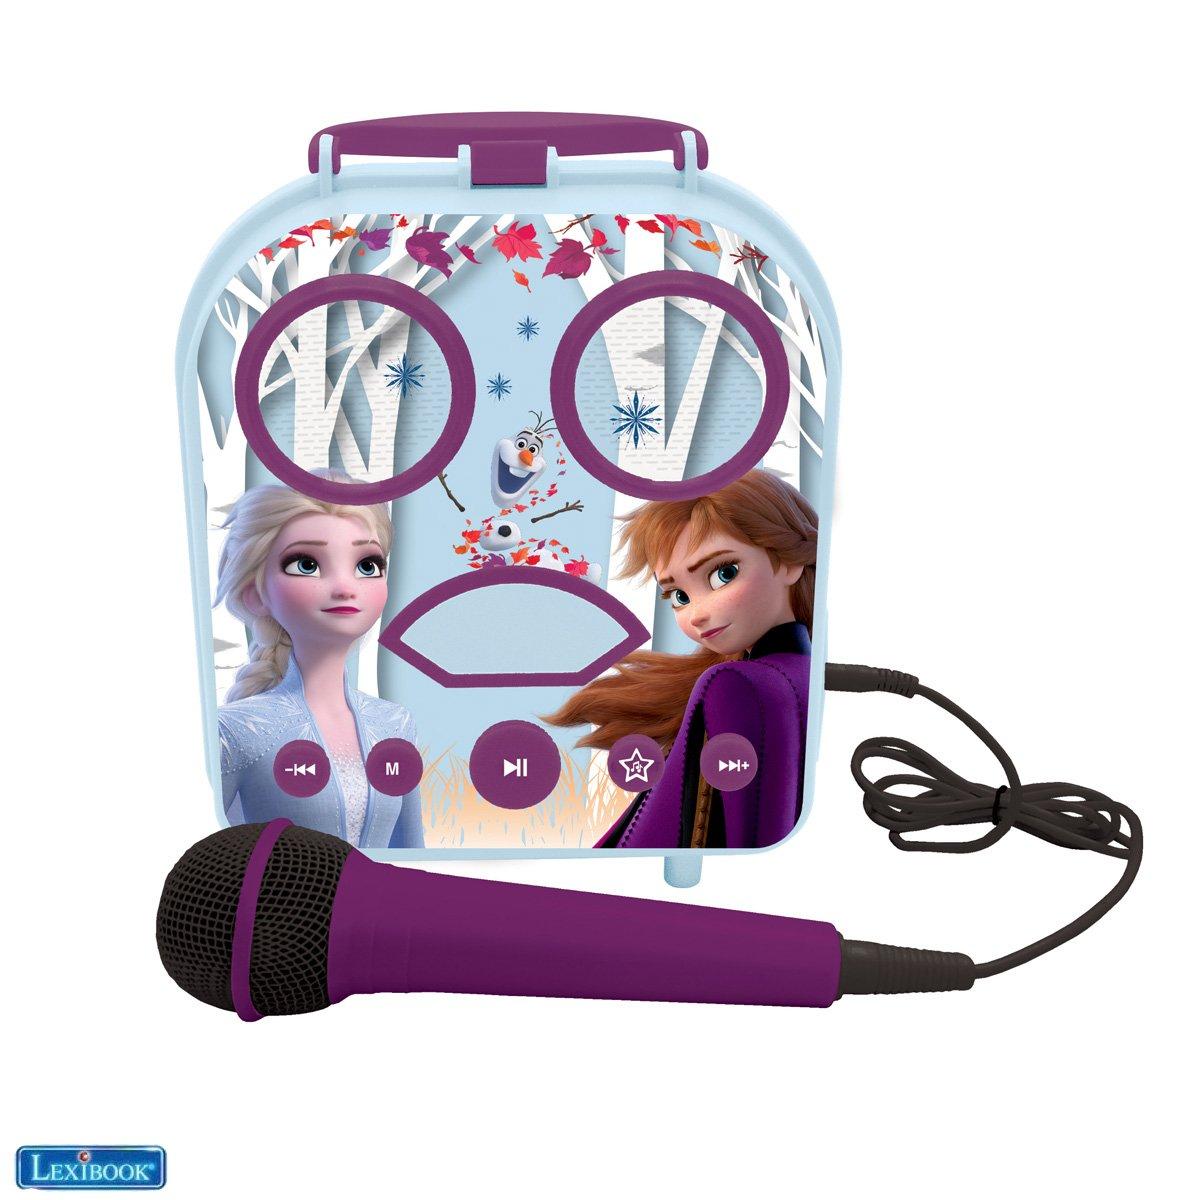 Lexibook - My Secret Portable Karaoke Frozen (BTC050FZ)